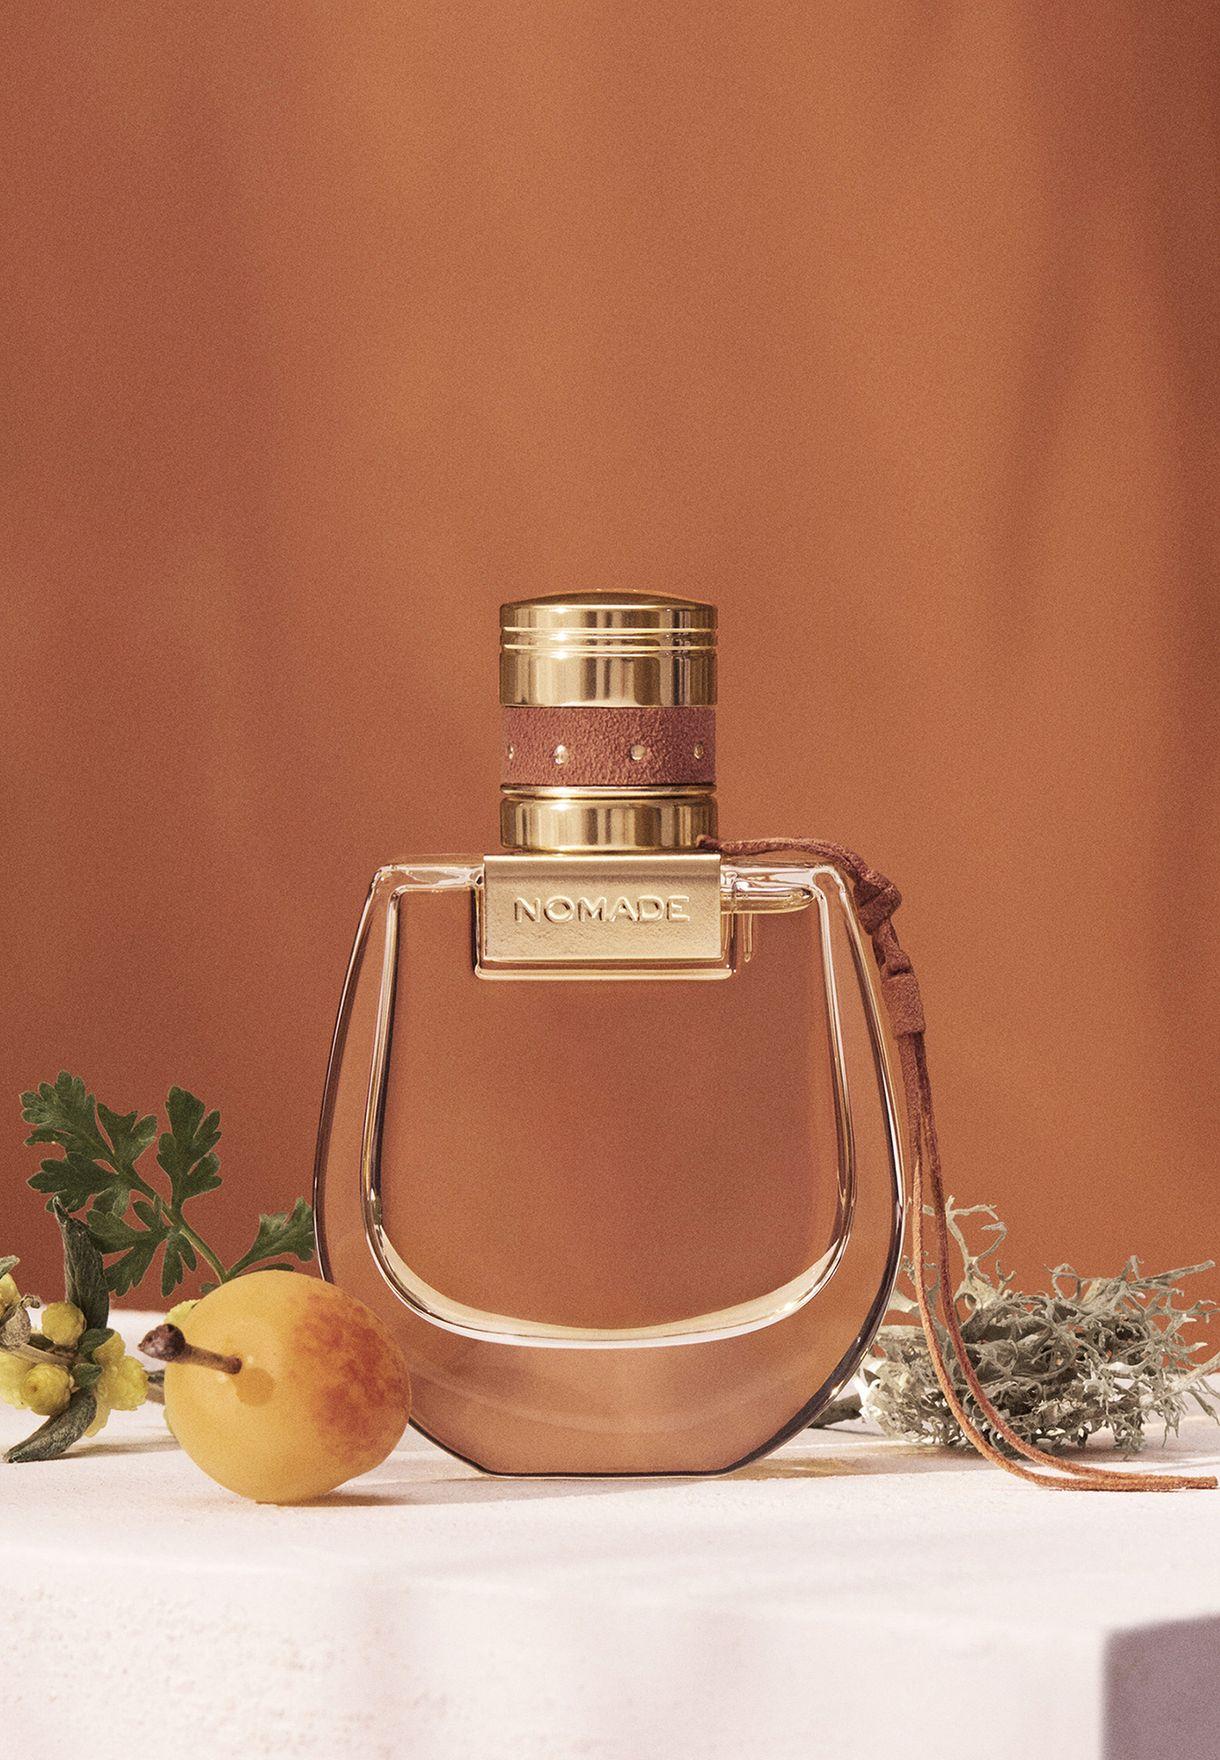 Nomad Absolu De Parfum 50ml